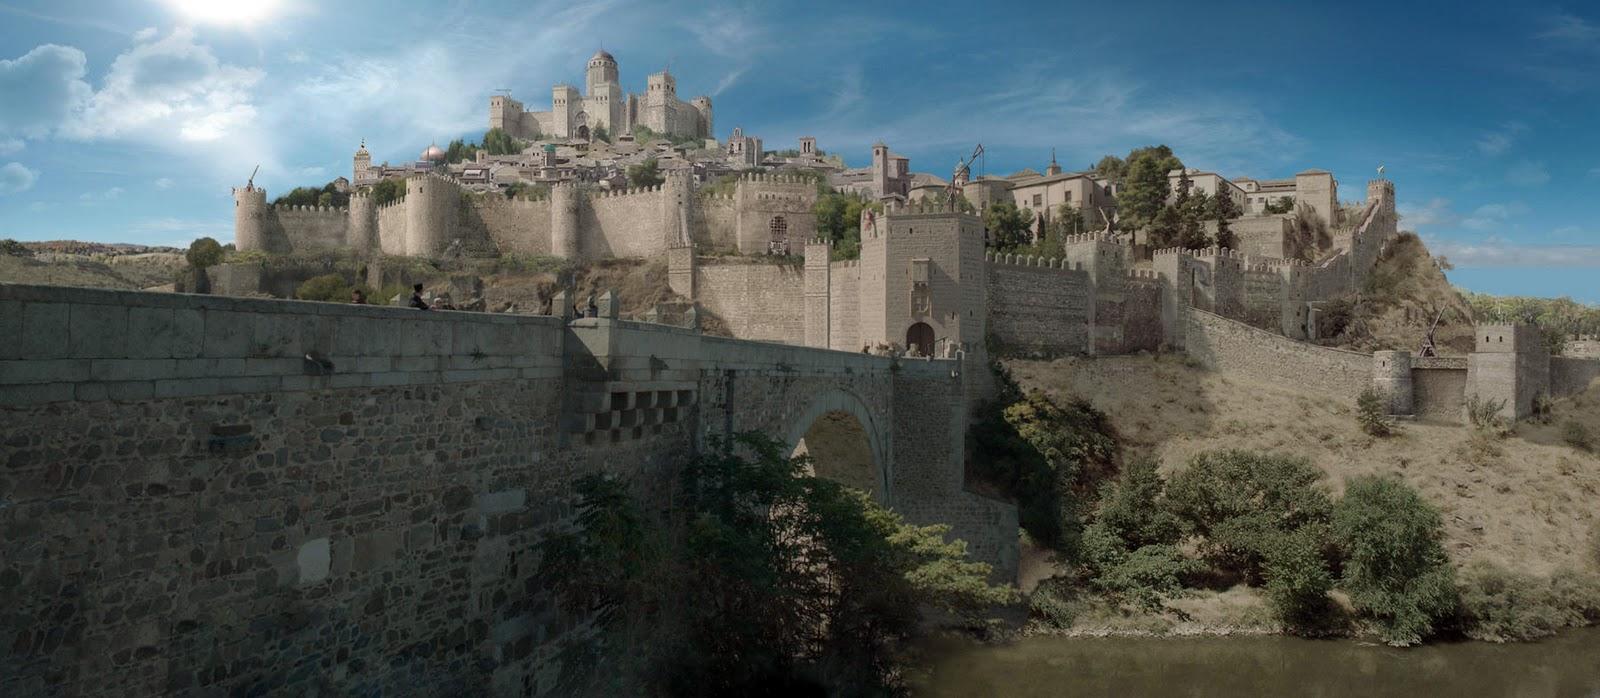 AAR HISPANIA 1200  01.03b+Entrada+a+Toledo+-+Maqueta+digital+%2528TELSON%2529